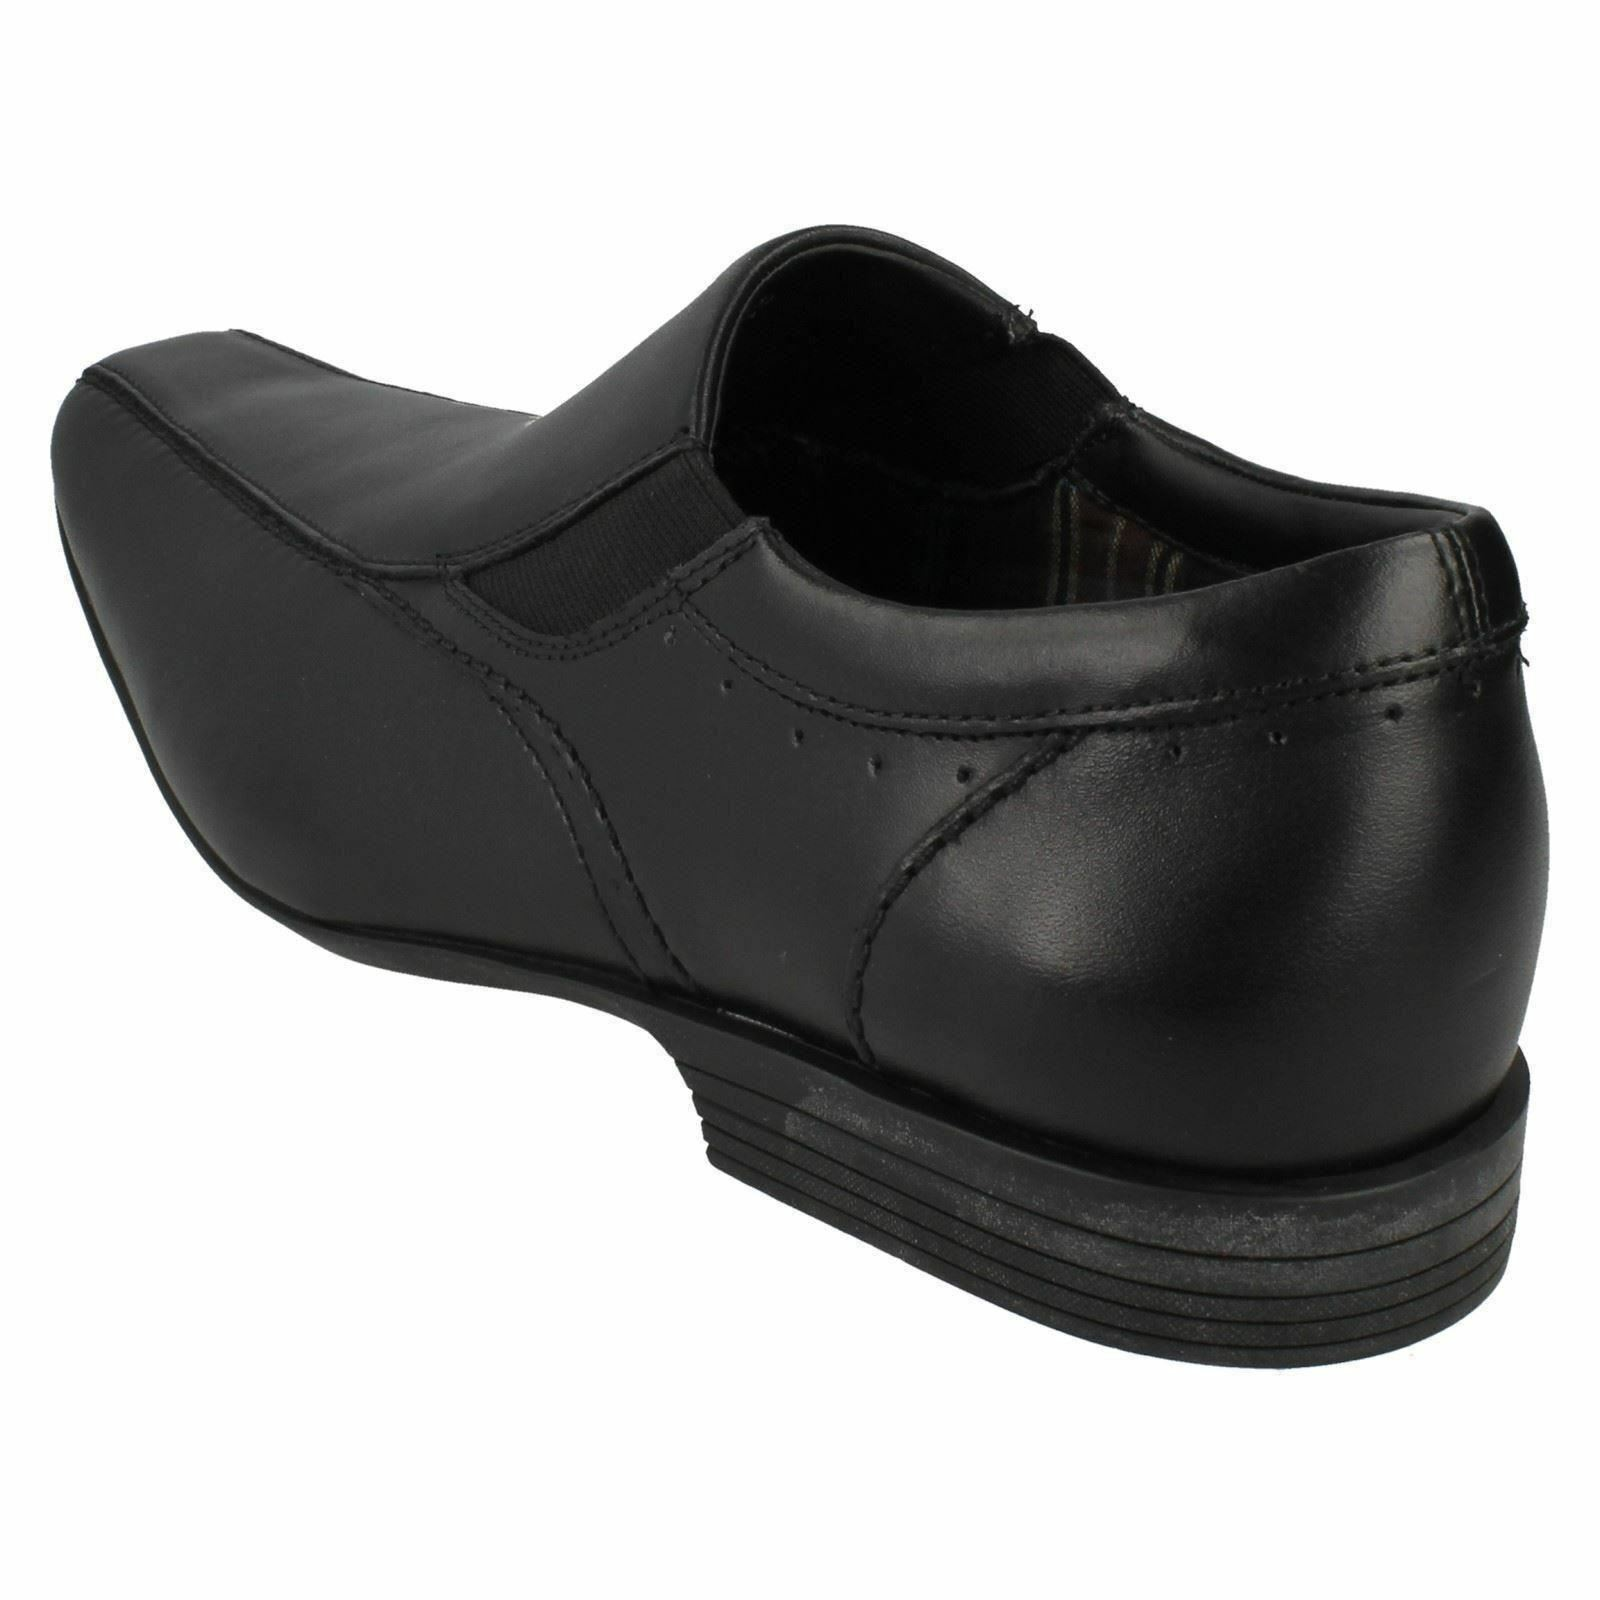 Herren Clarks Forbes Step schwarzes G Leder Formell Slipper Schuhe G schwarzes PASSFORM 514eb8